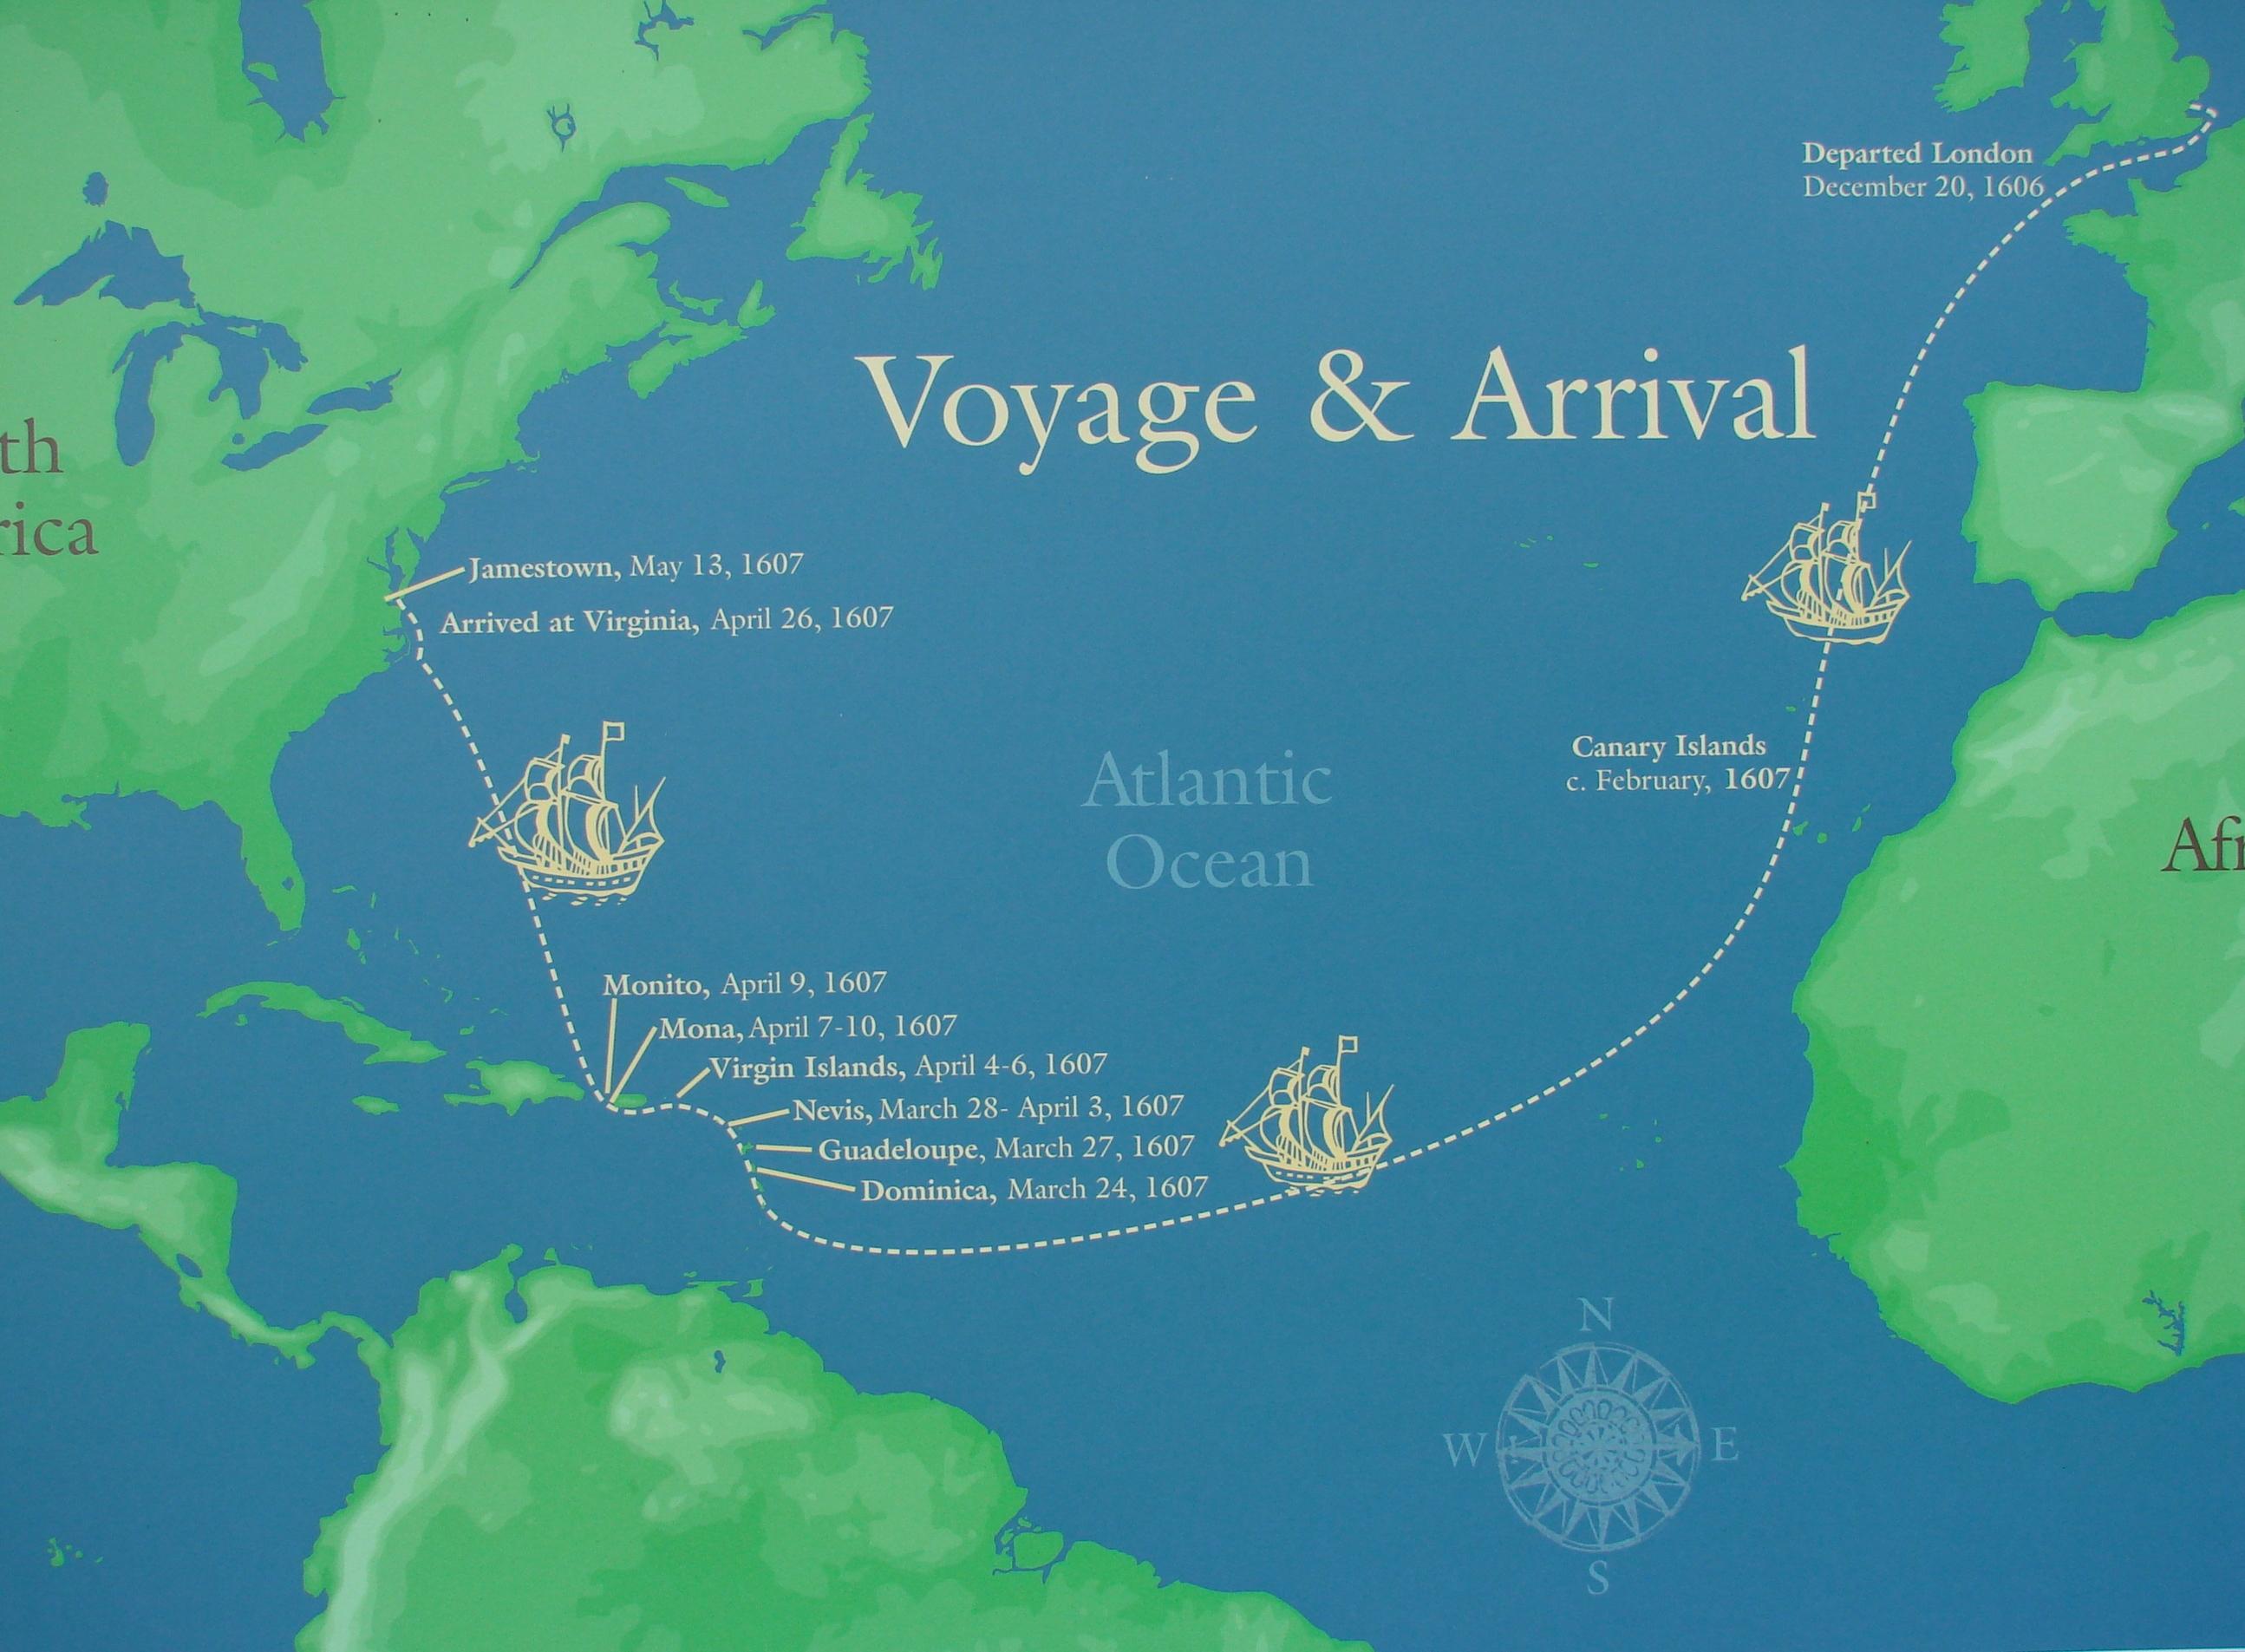 33 arrival of the english in virginia virtual jamestown - HD1600×956